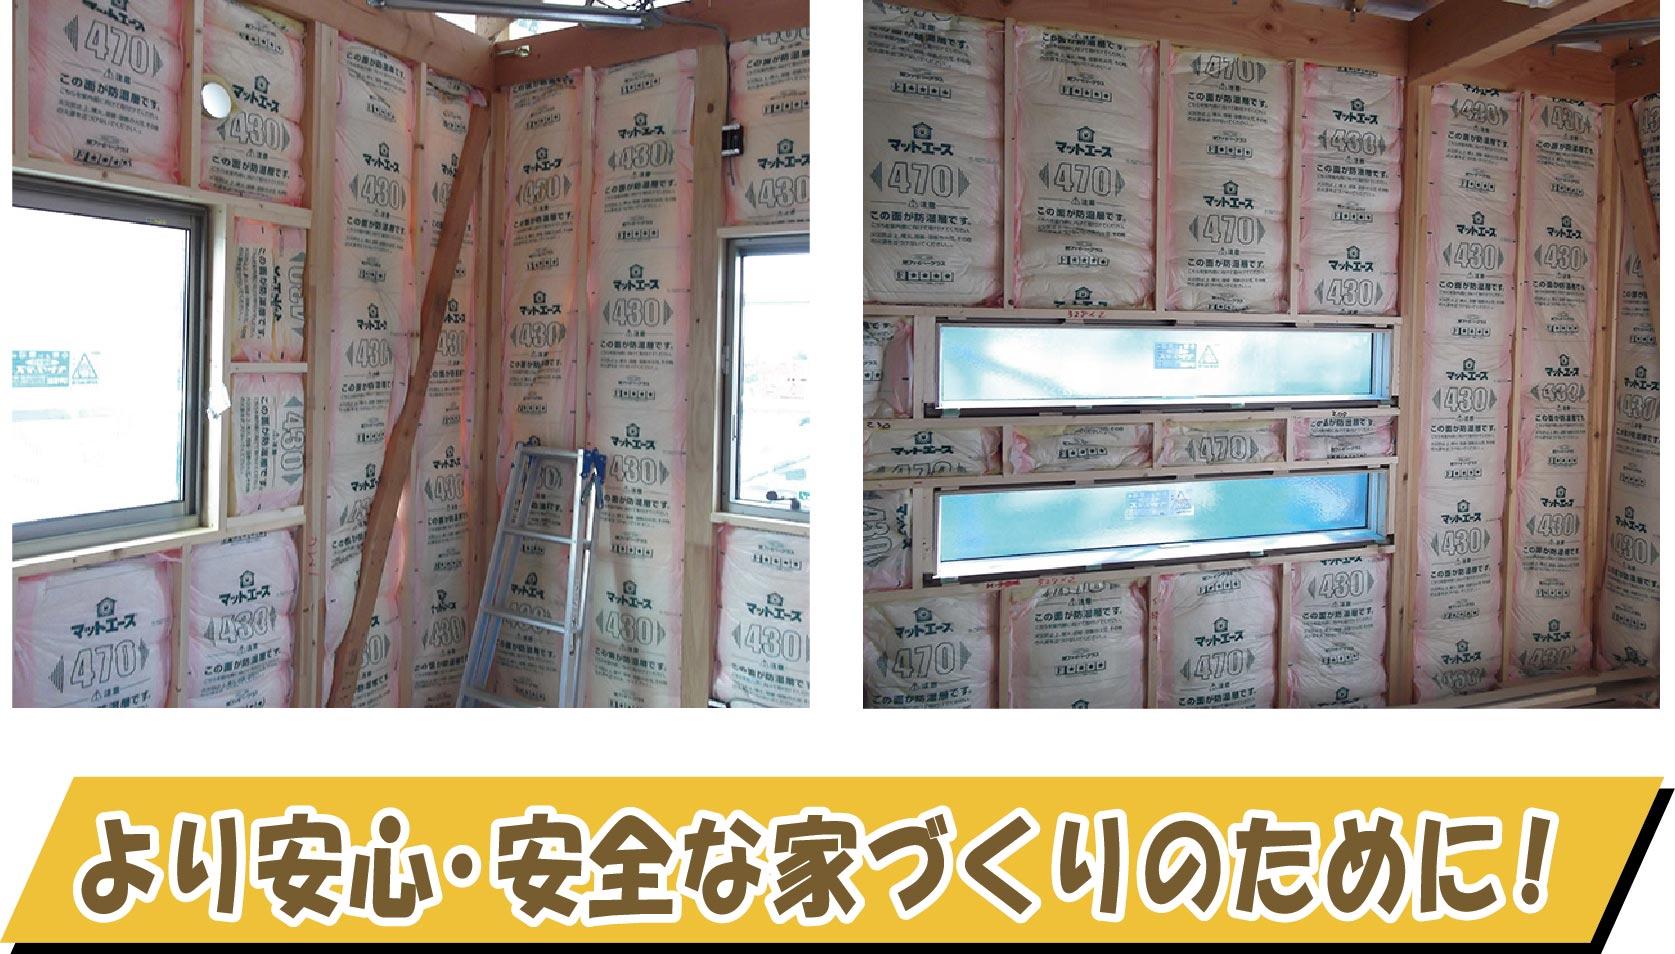 KuraSi-natu-sin90-08.jpg